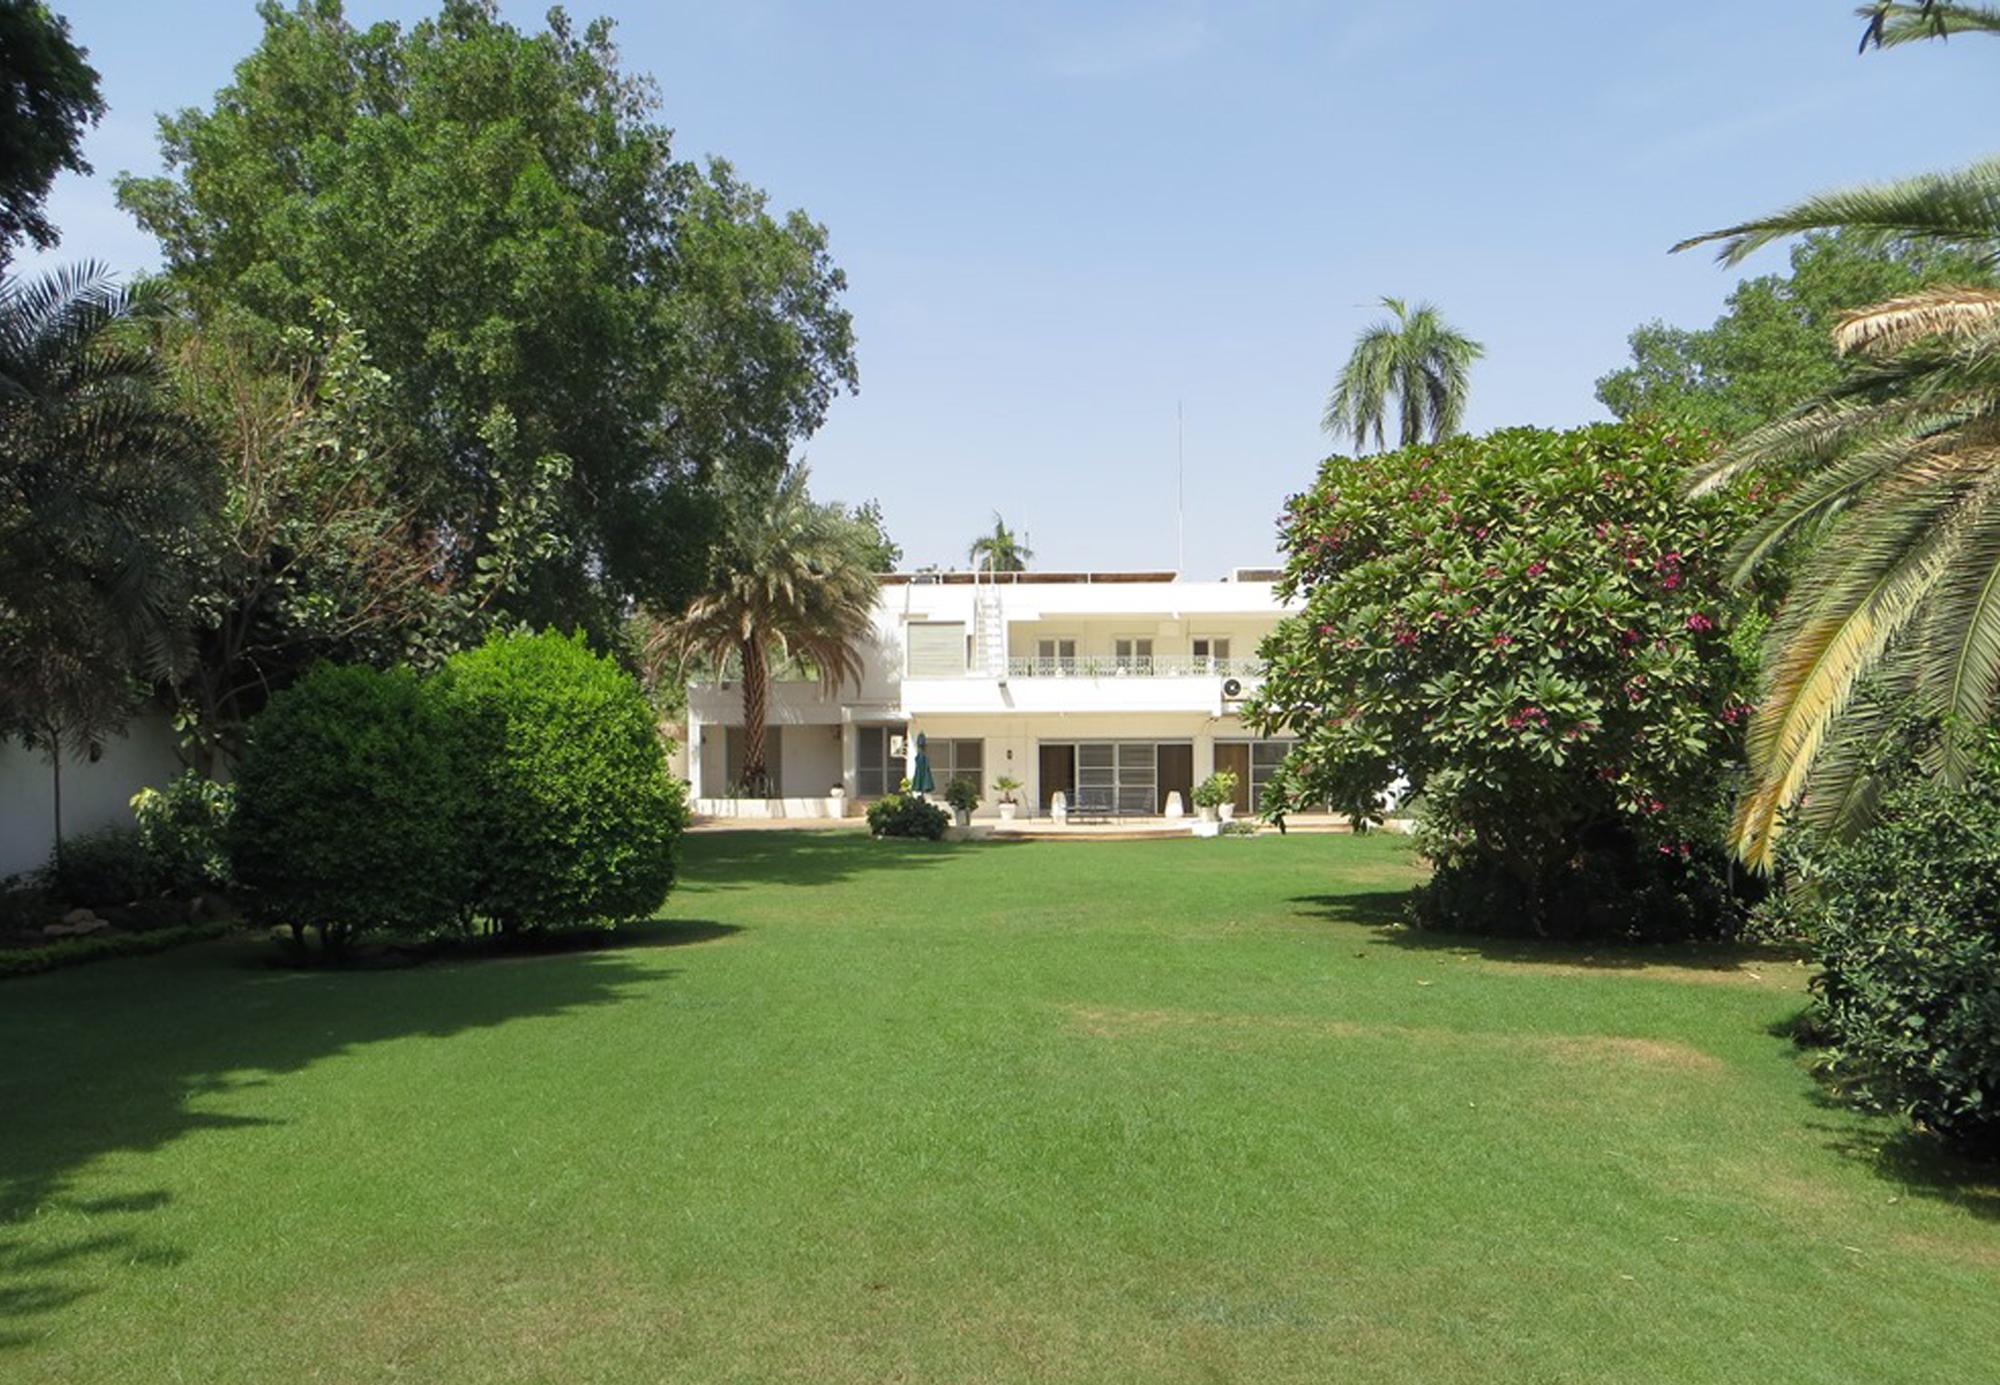 Deutsche Botschaft Khartum